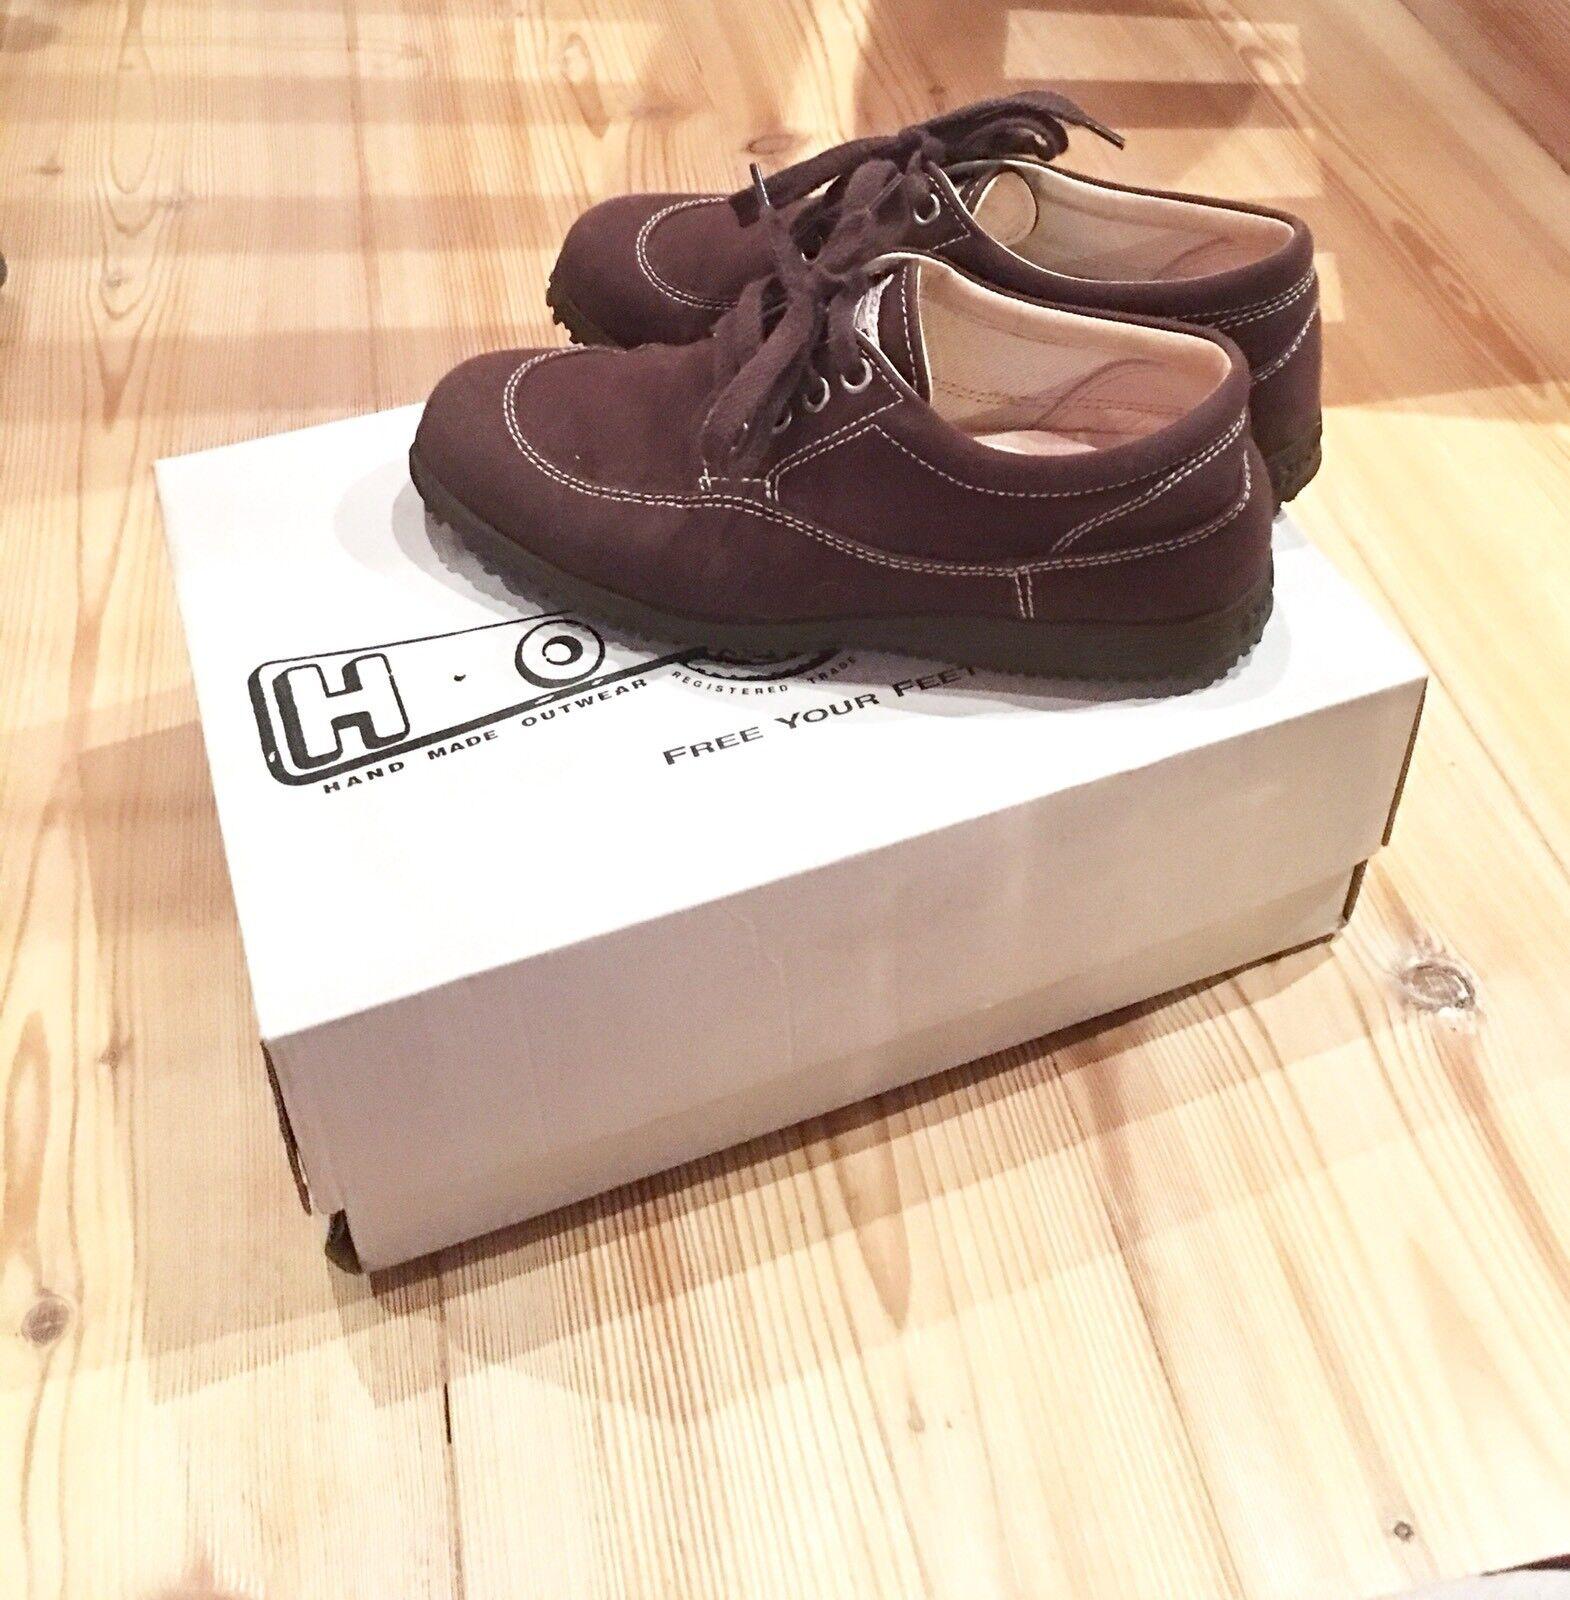 scarpe hogan donna tela marrone scuro n. 35